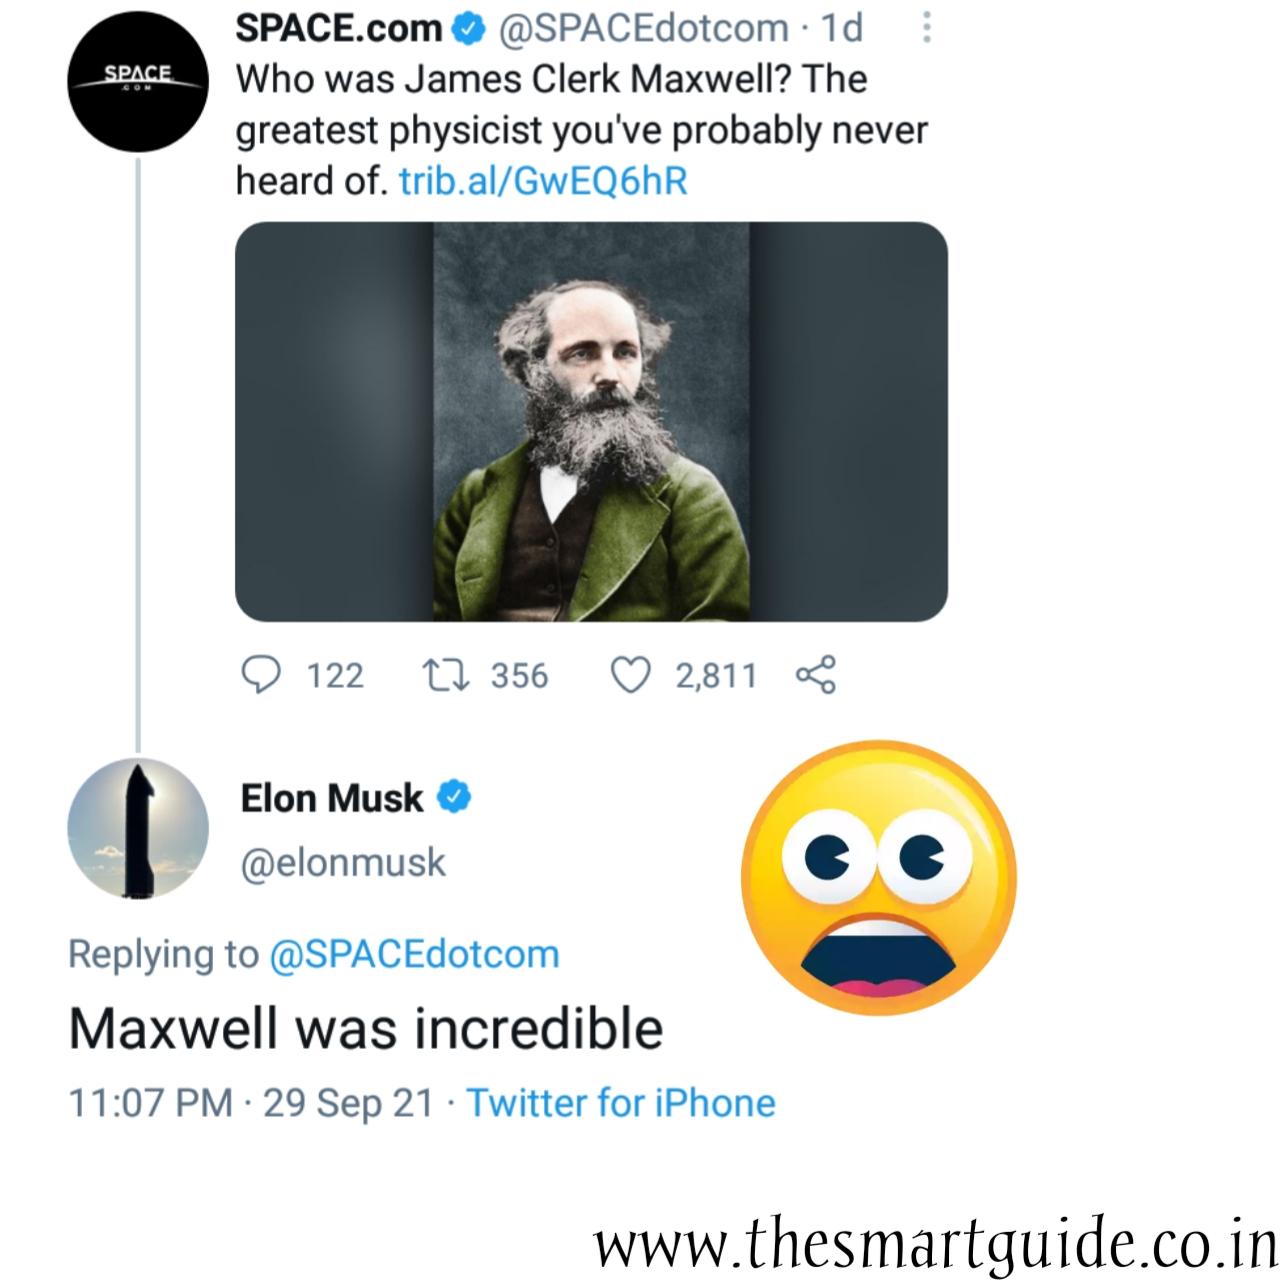 Why did Elon musk tweeted Maxwell was incredible